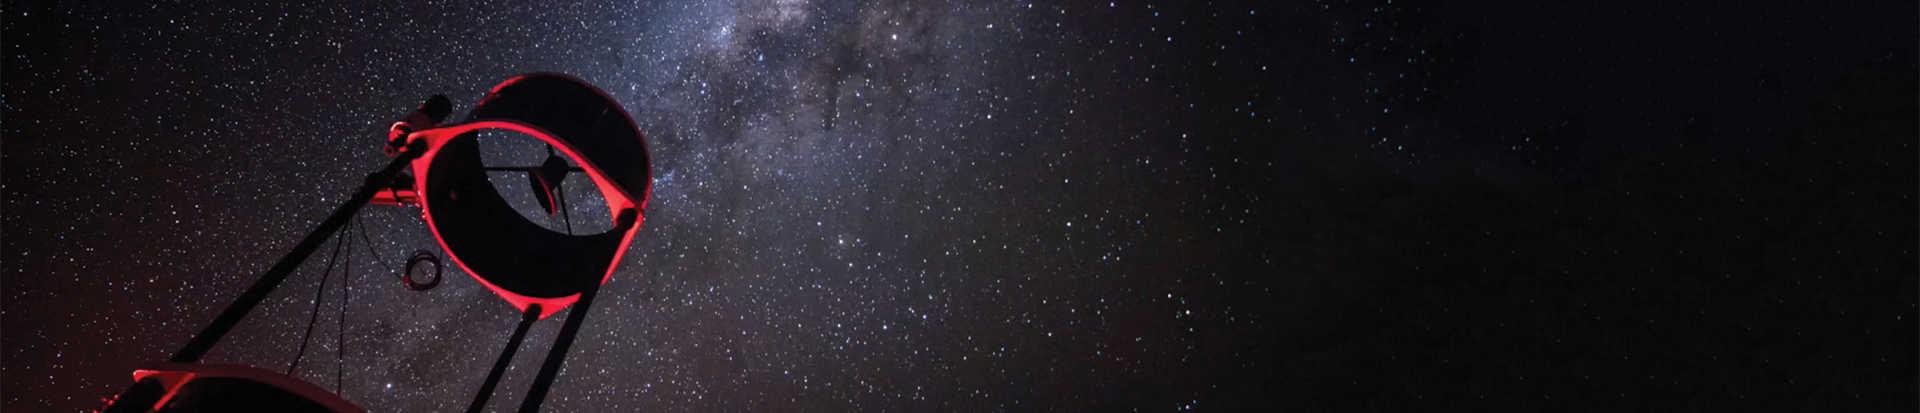 Telescope against starry night sky